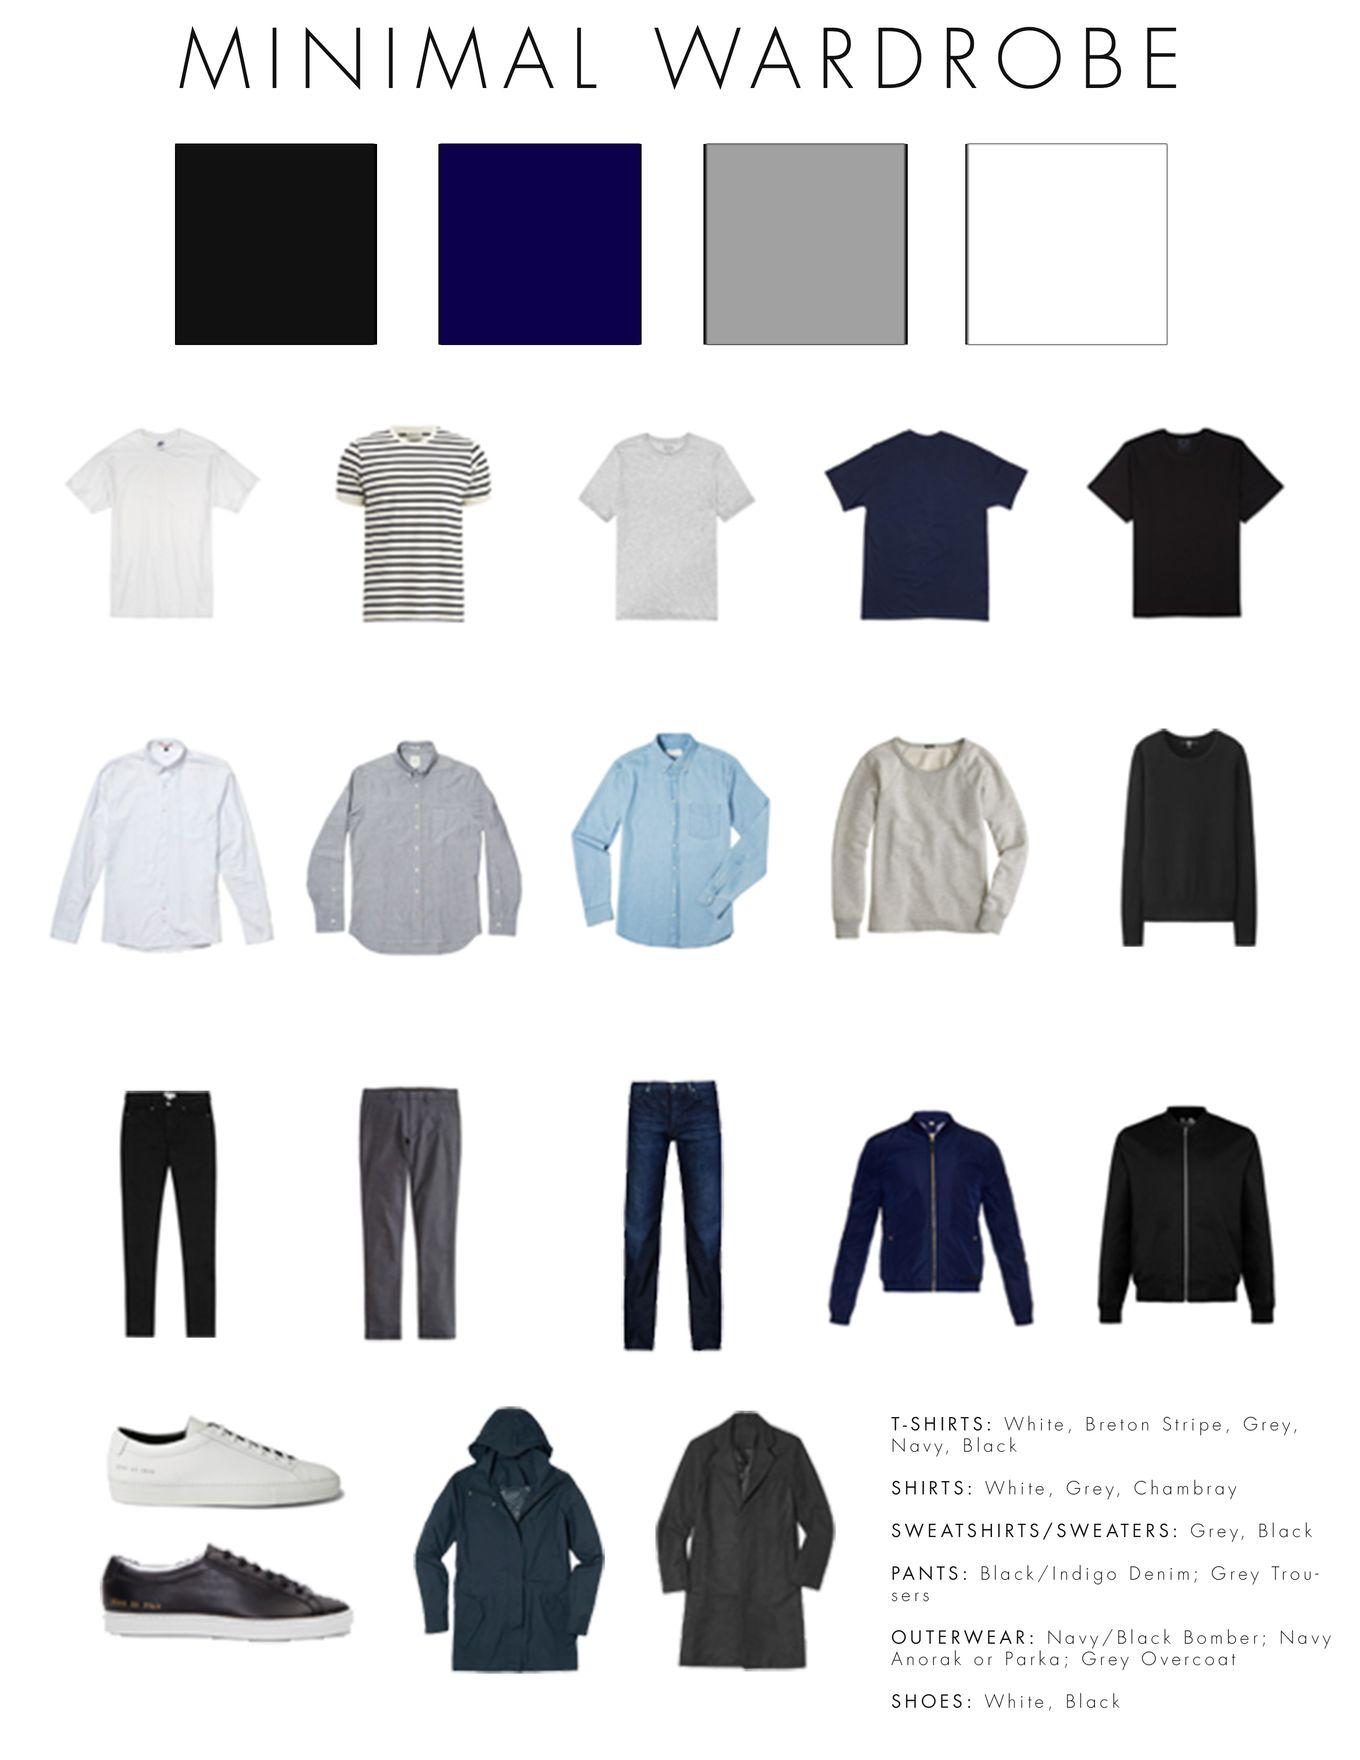 A Basic, Minimal Wardrobe